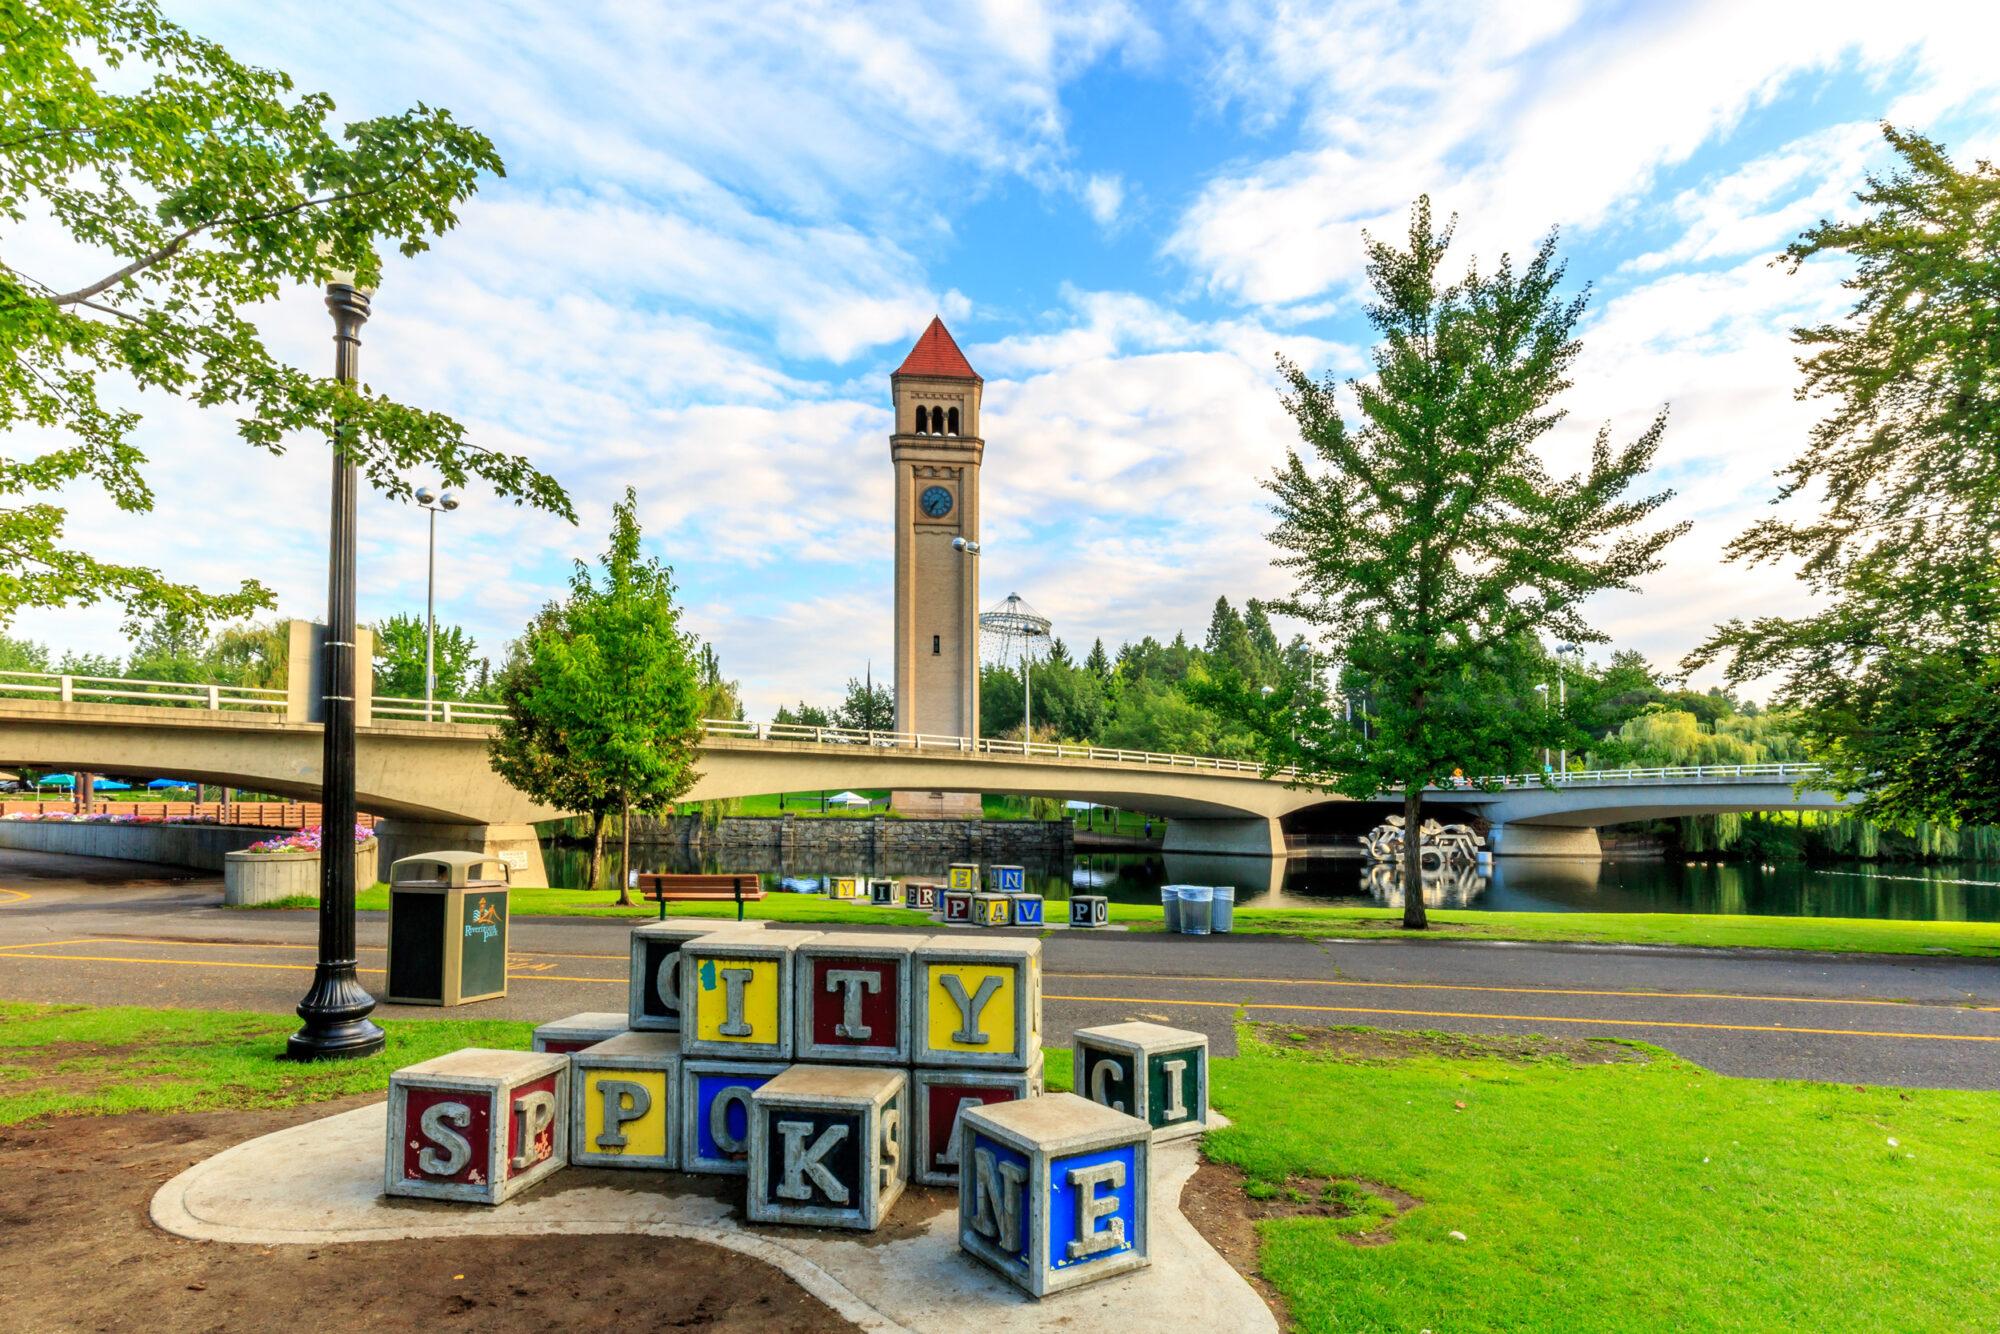 Downtown Spokane City of Spokane Blocks and Clocktower